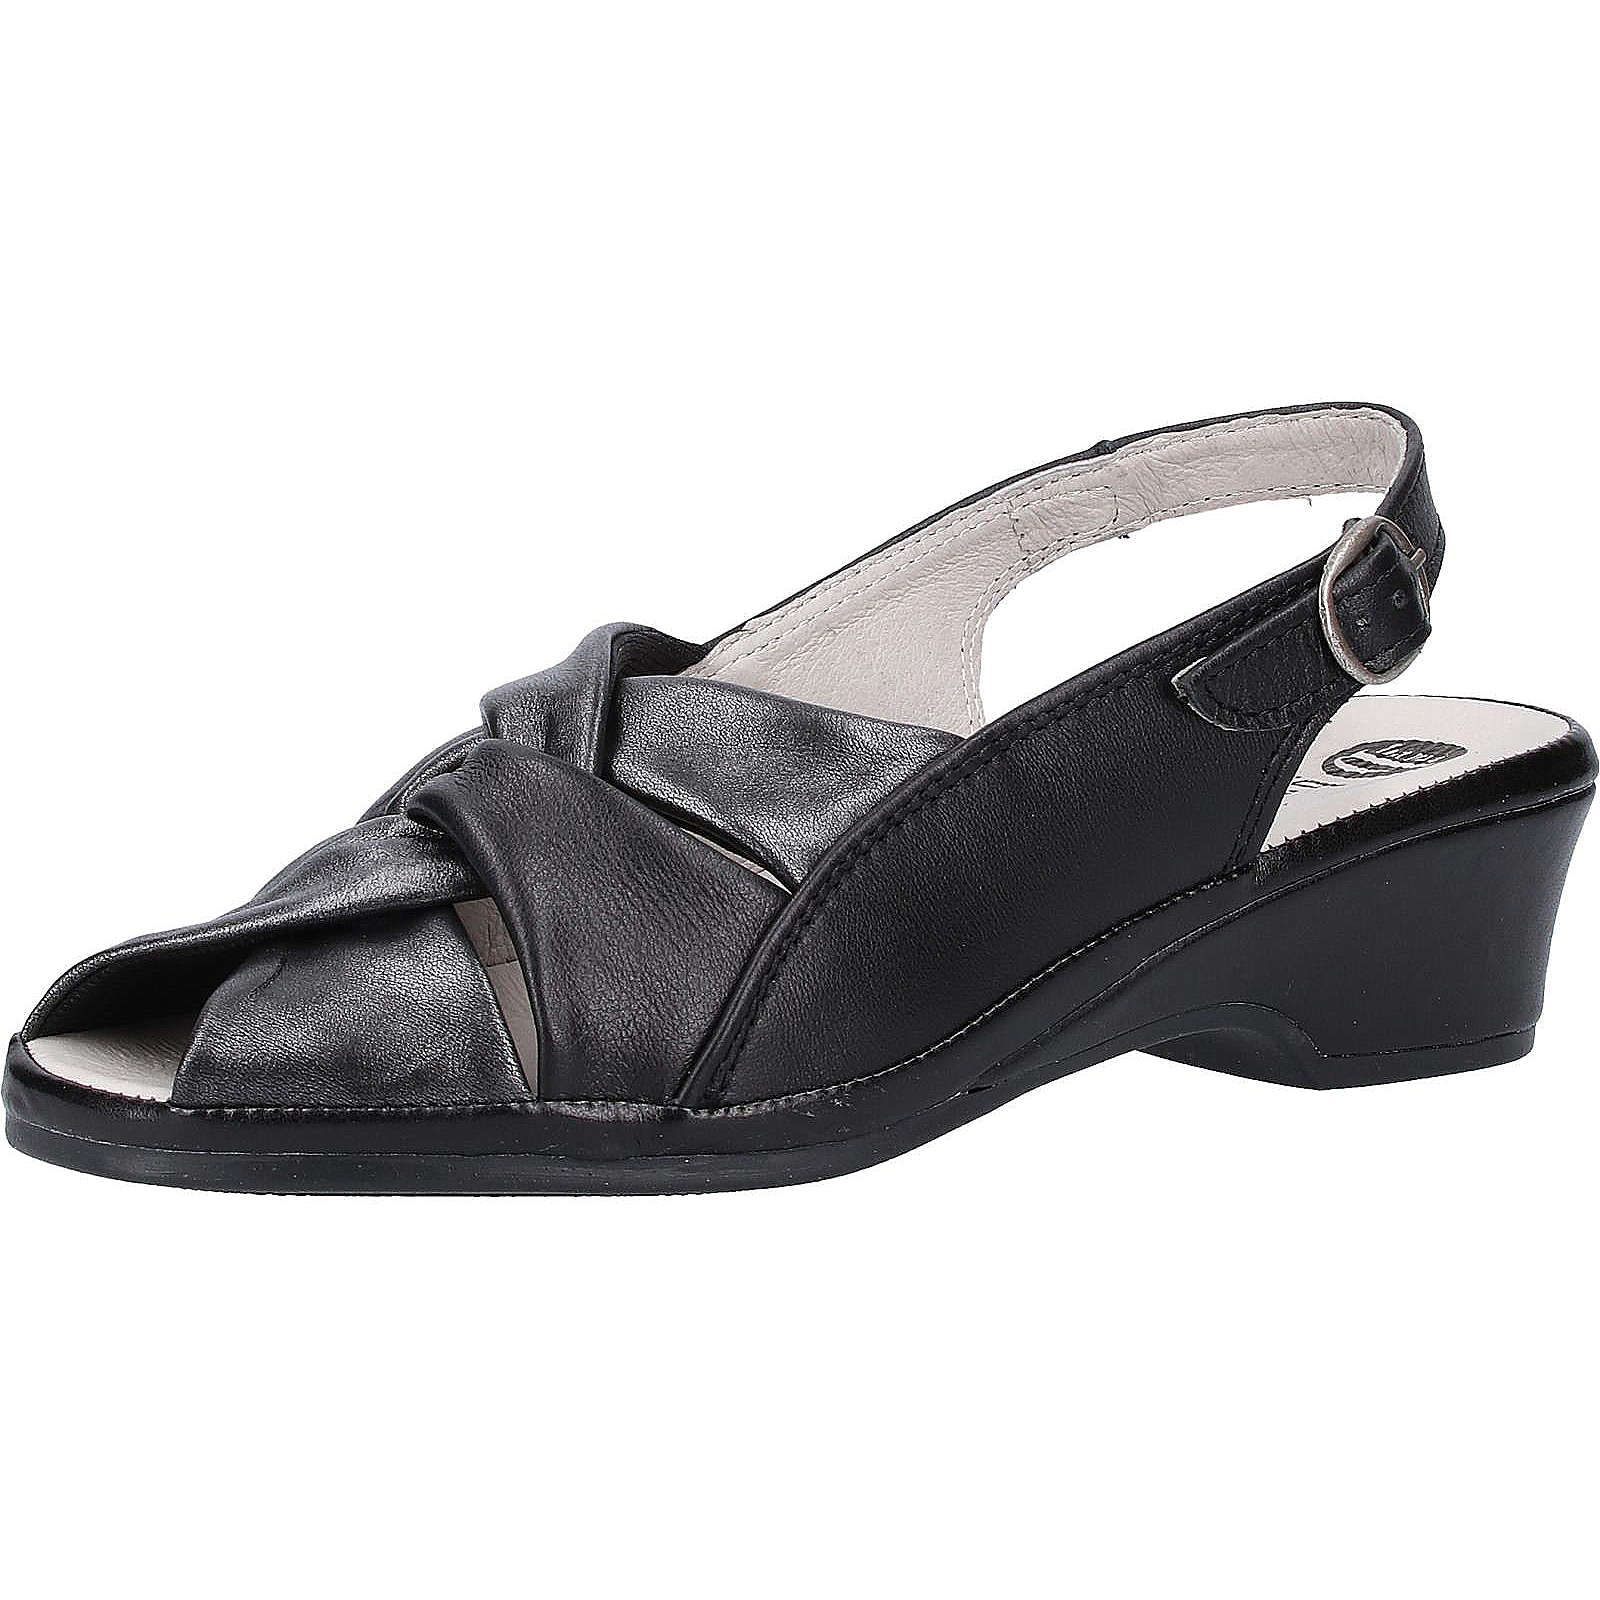 bama Sandalen Klassische Sandaletten schwarz Damen Gr. 37